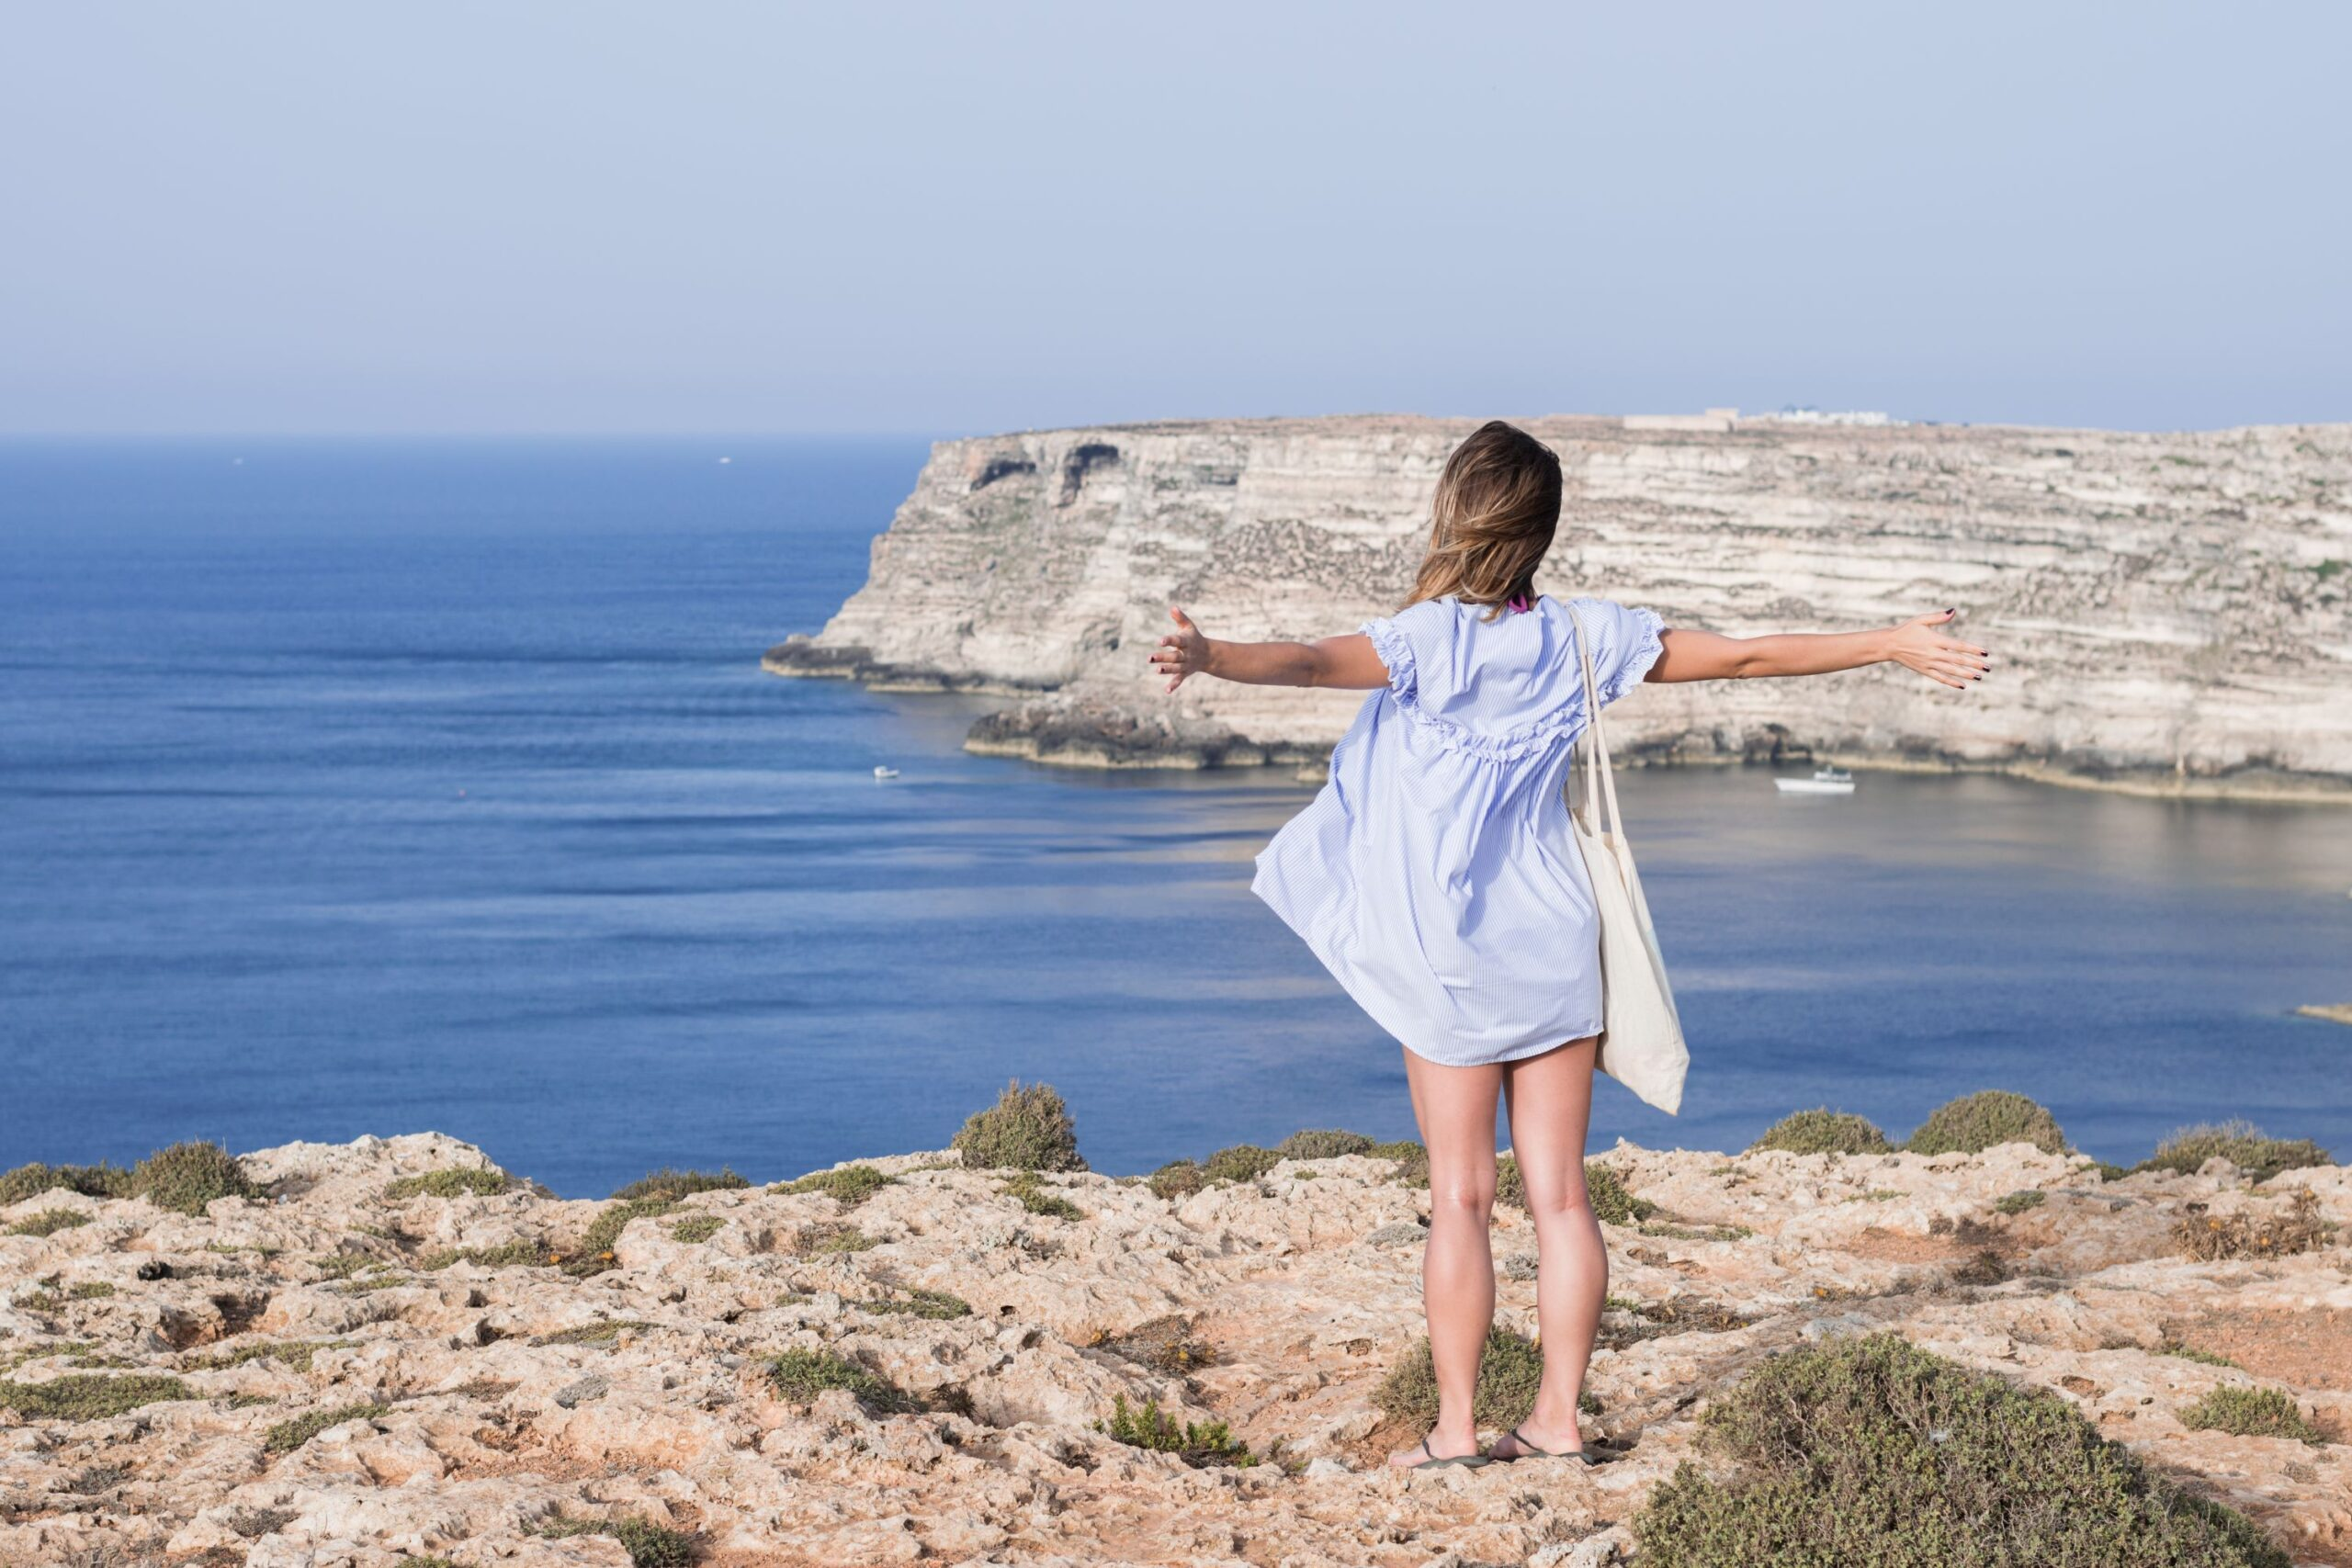 Lampedusa, licencja: shutterstock/By vincenzo scarantino